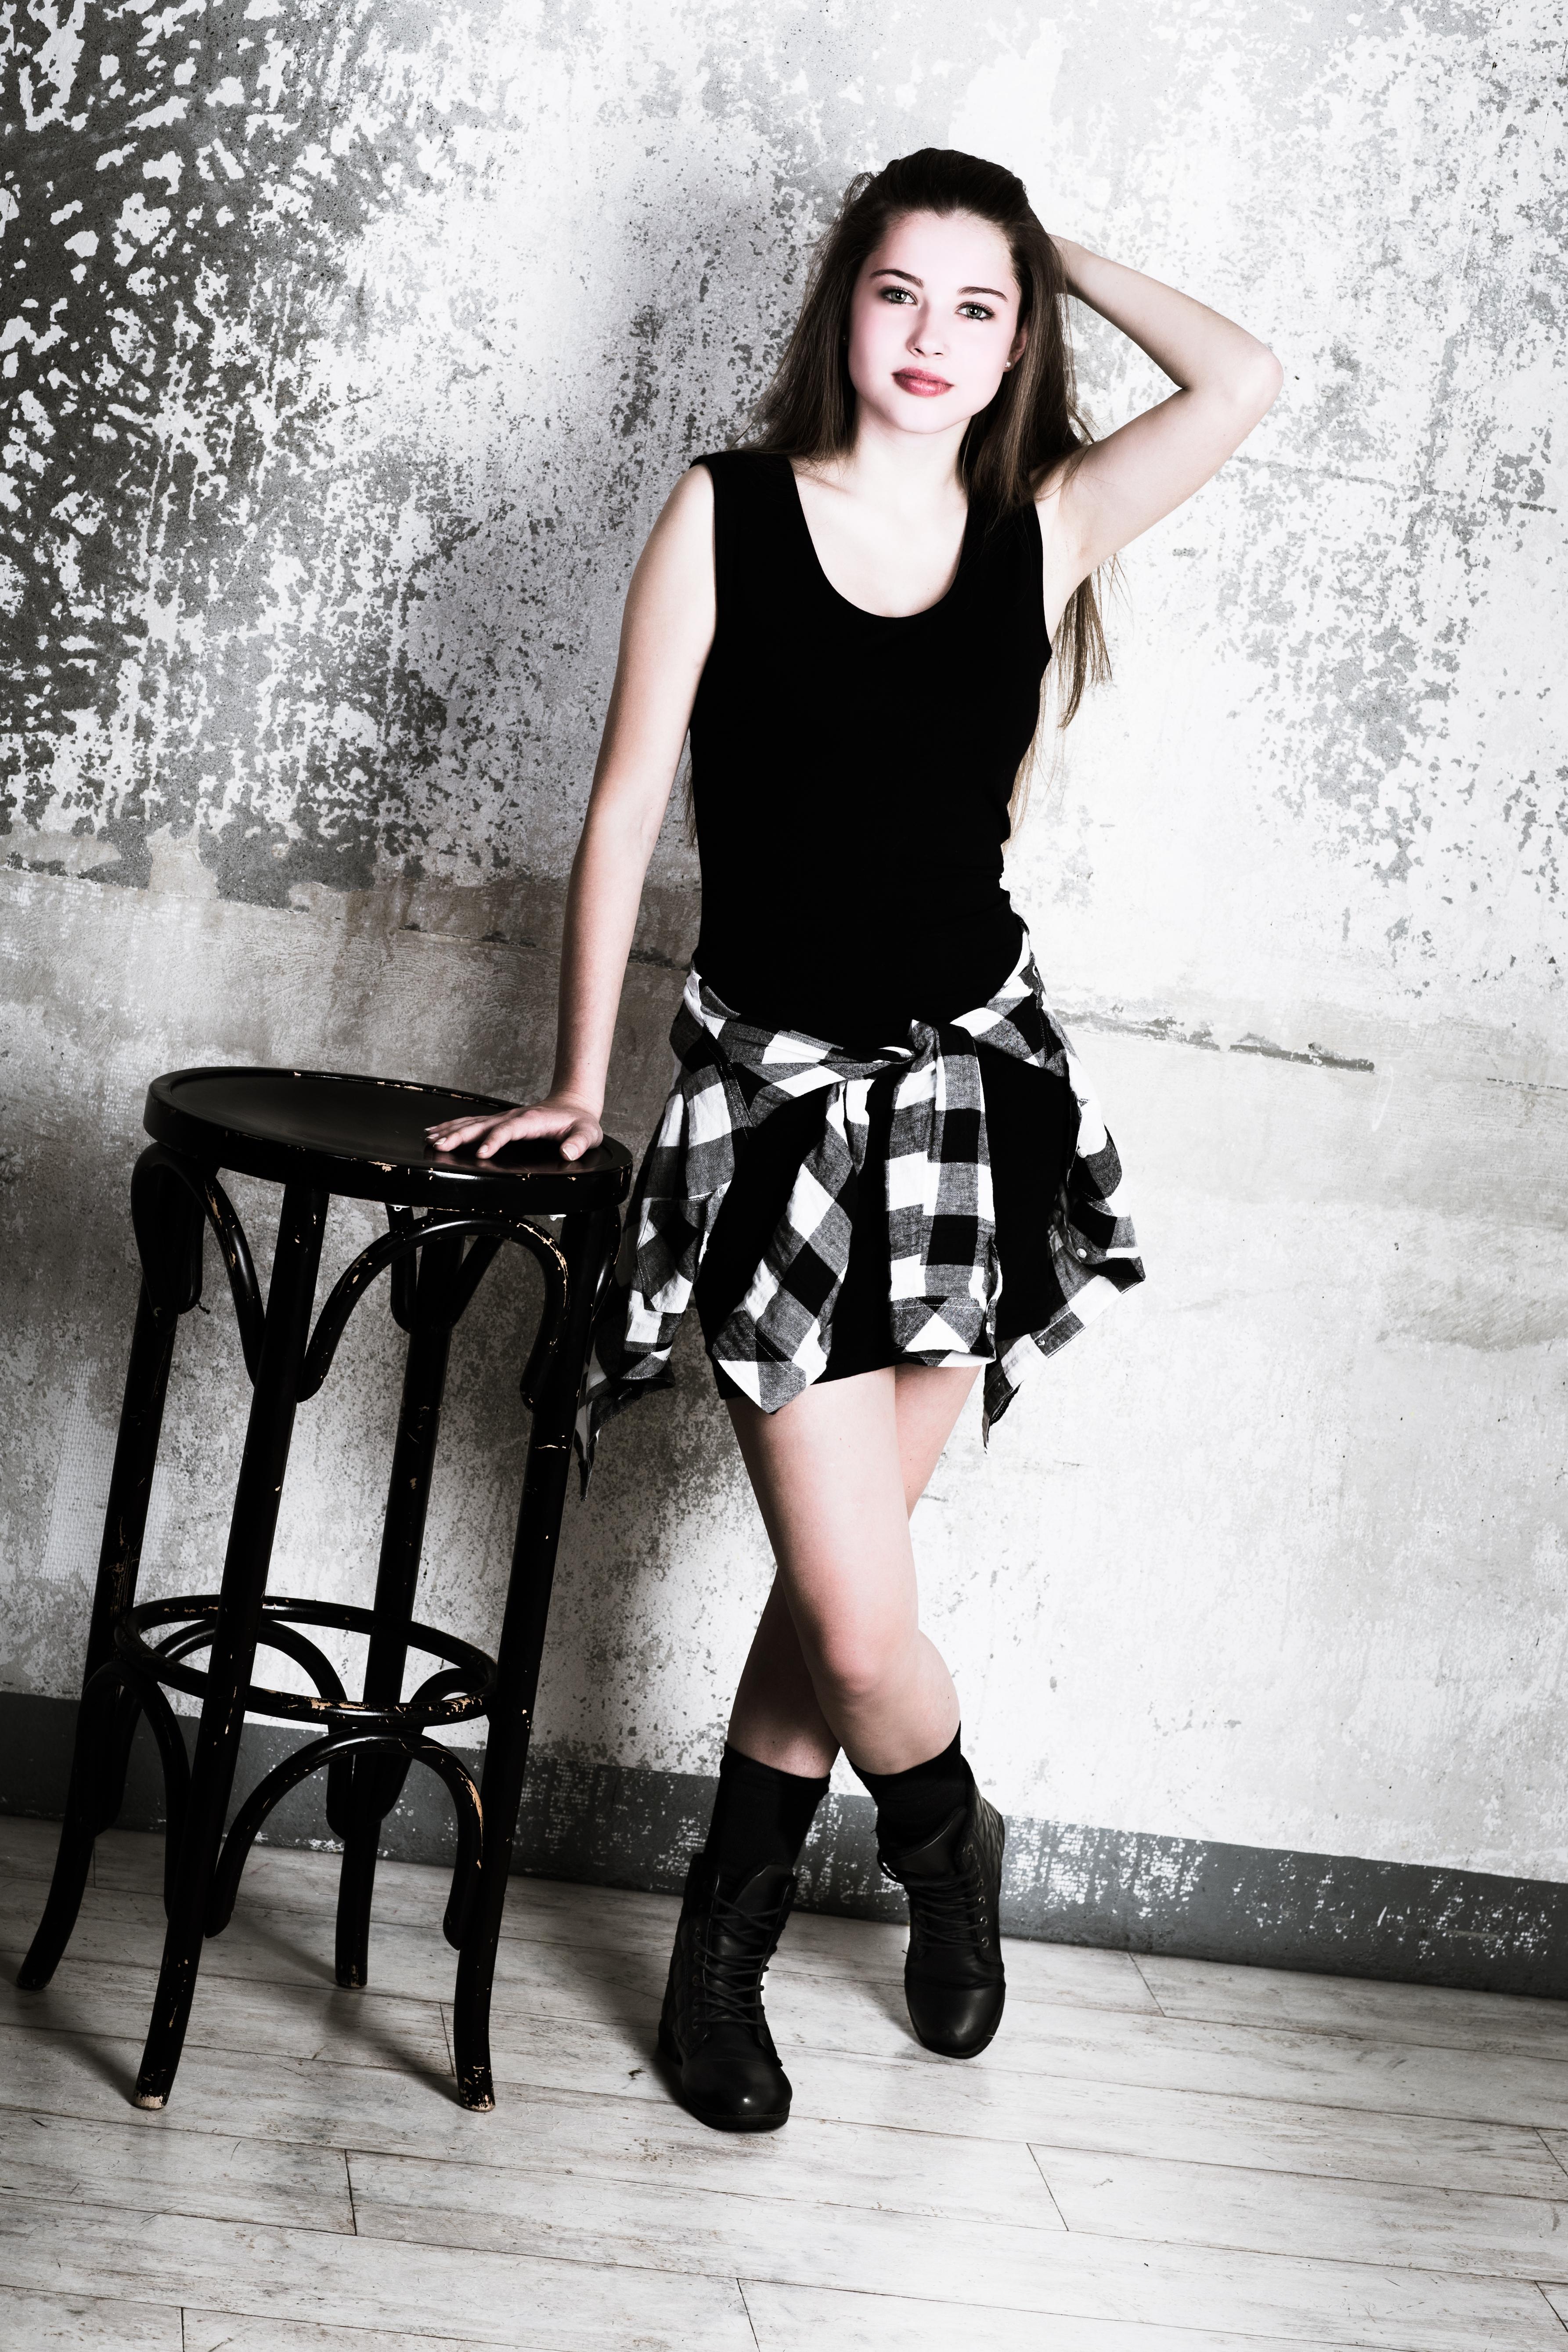 modell_12